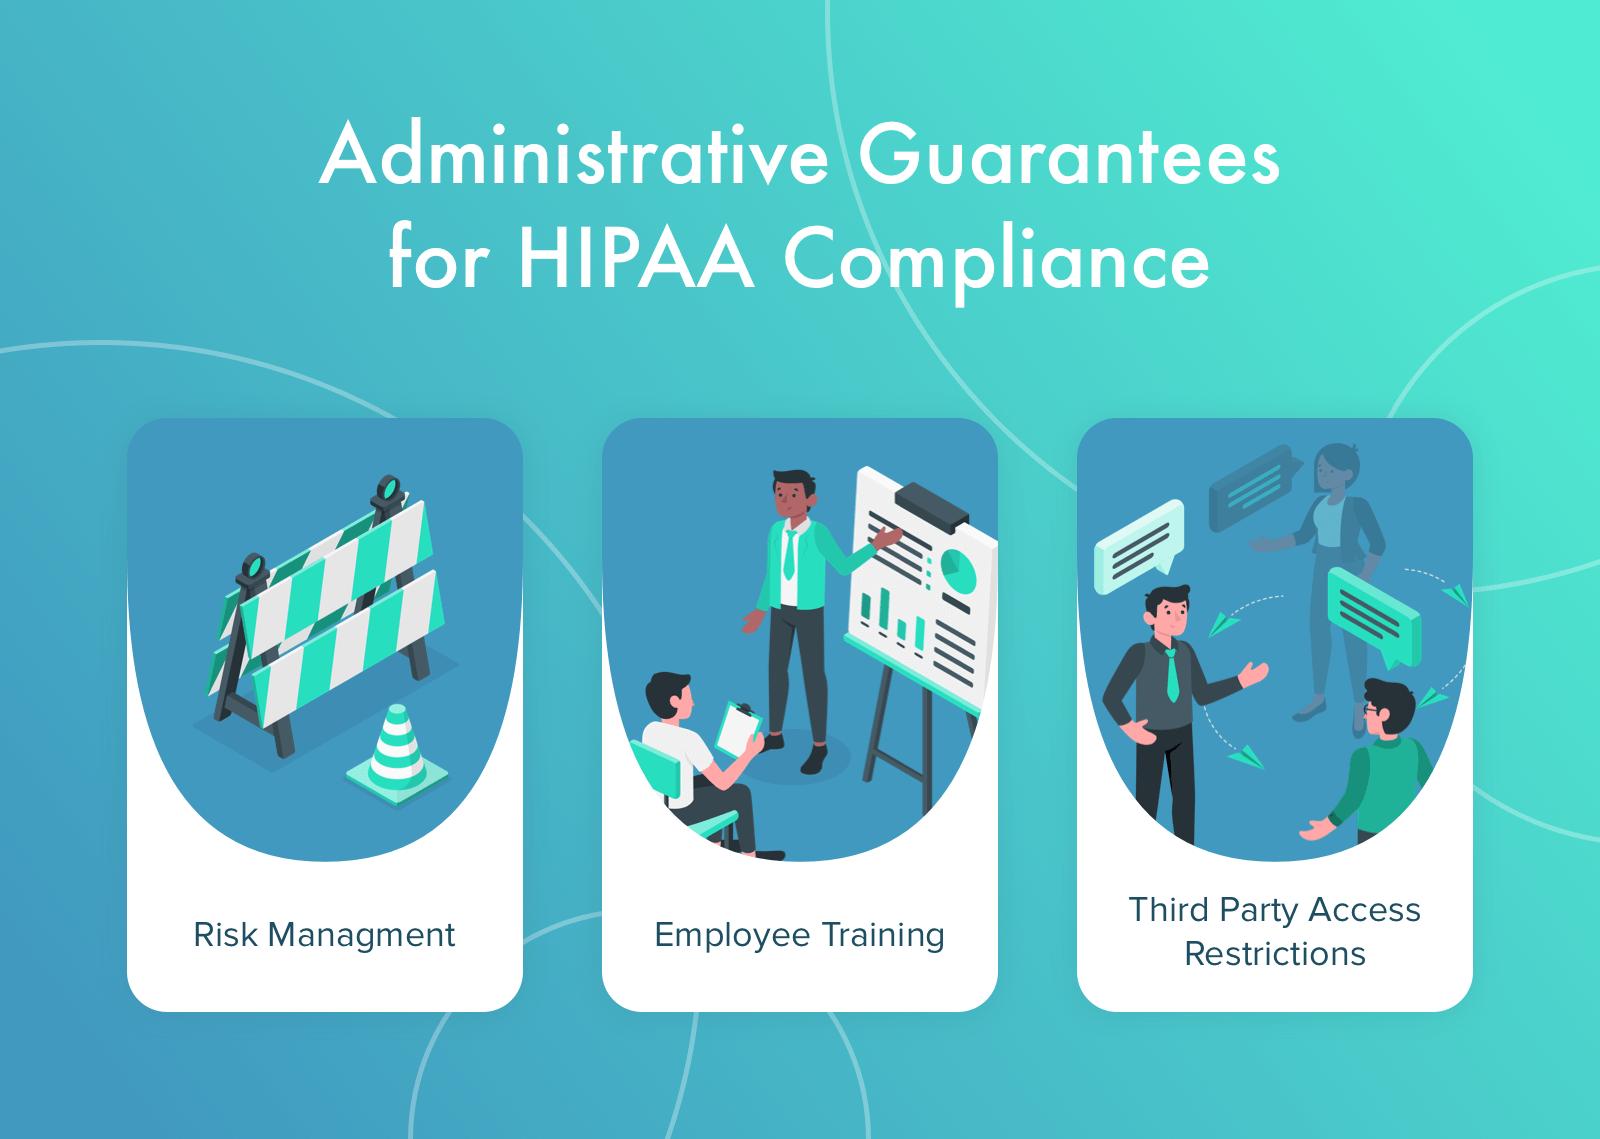 Administrative Guarantees for HIPAA Compliance